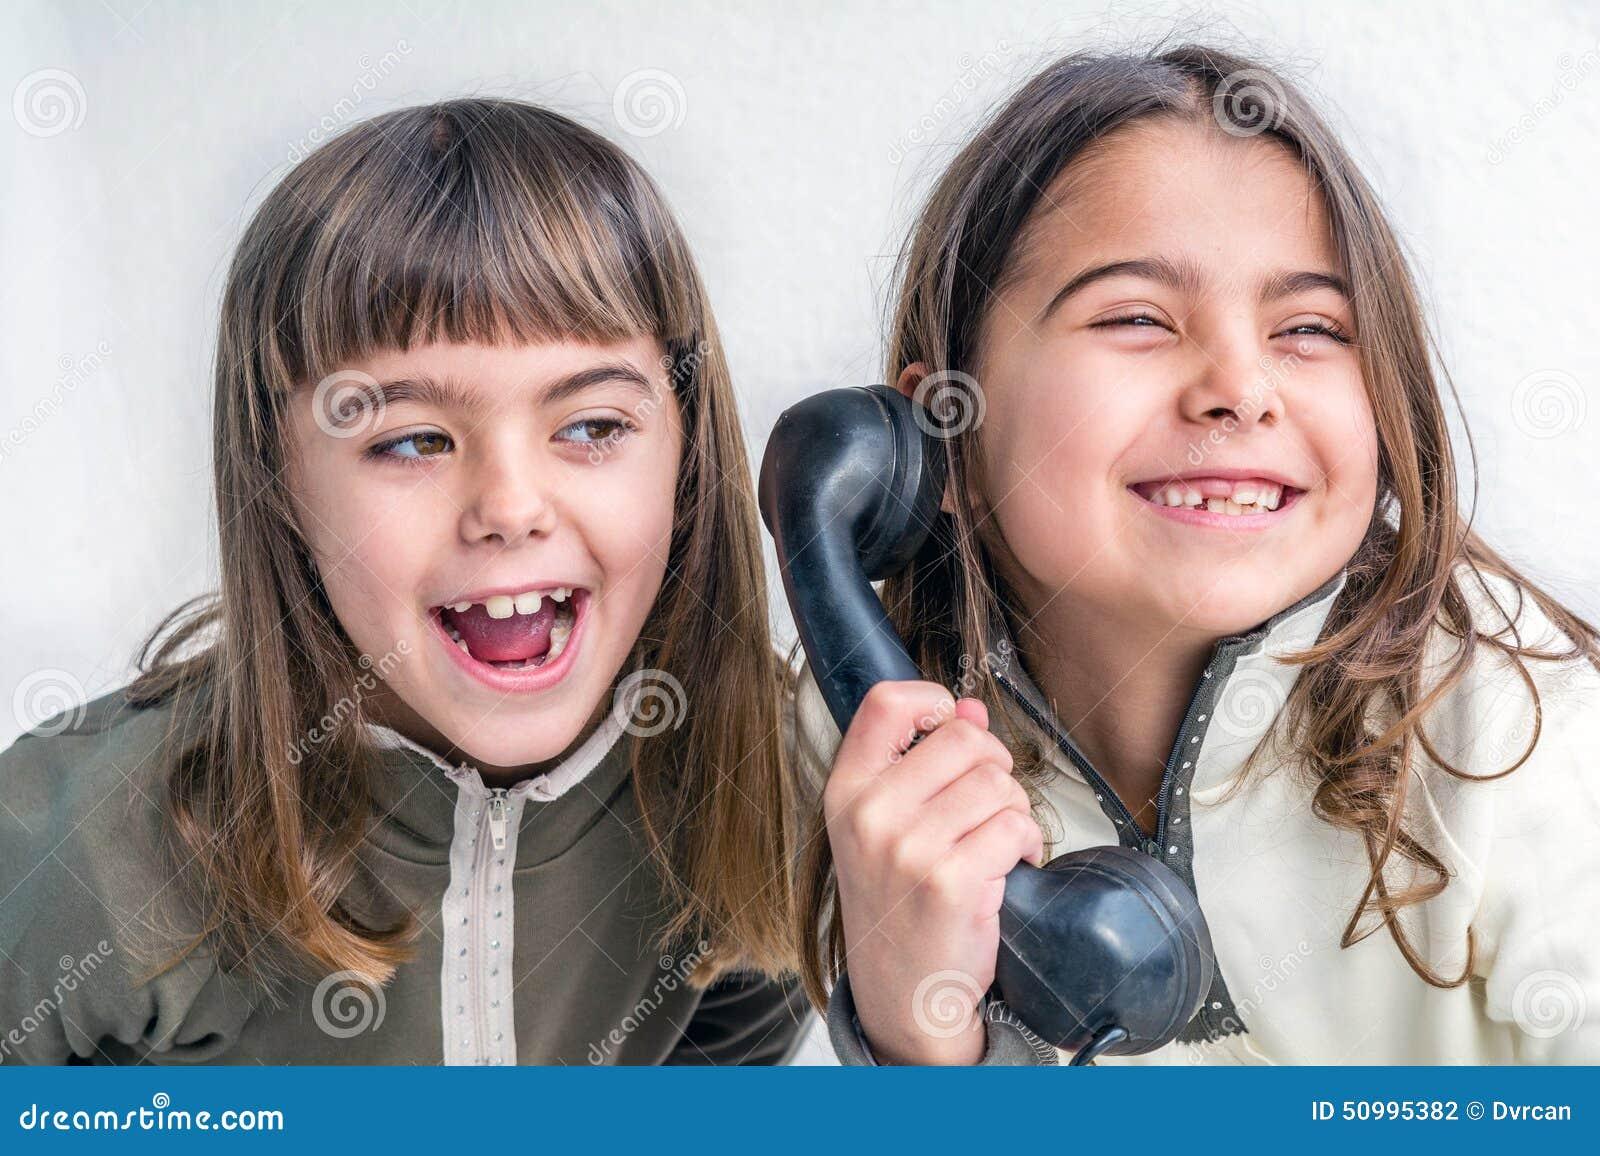 Lesbian While The Phone